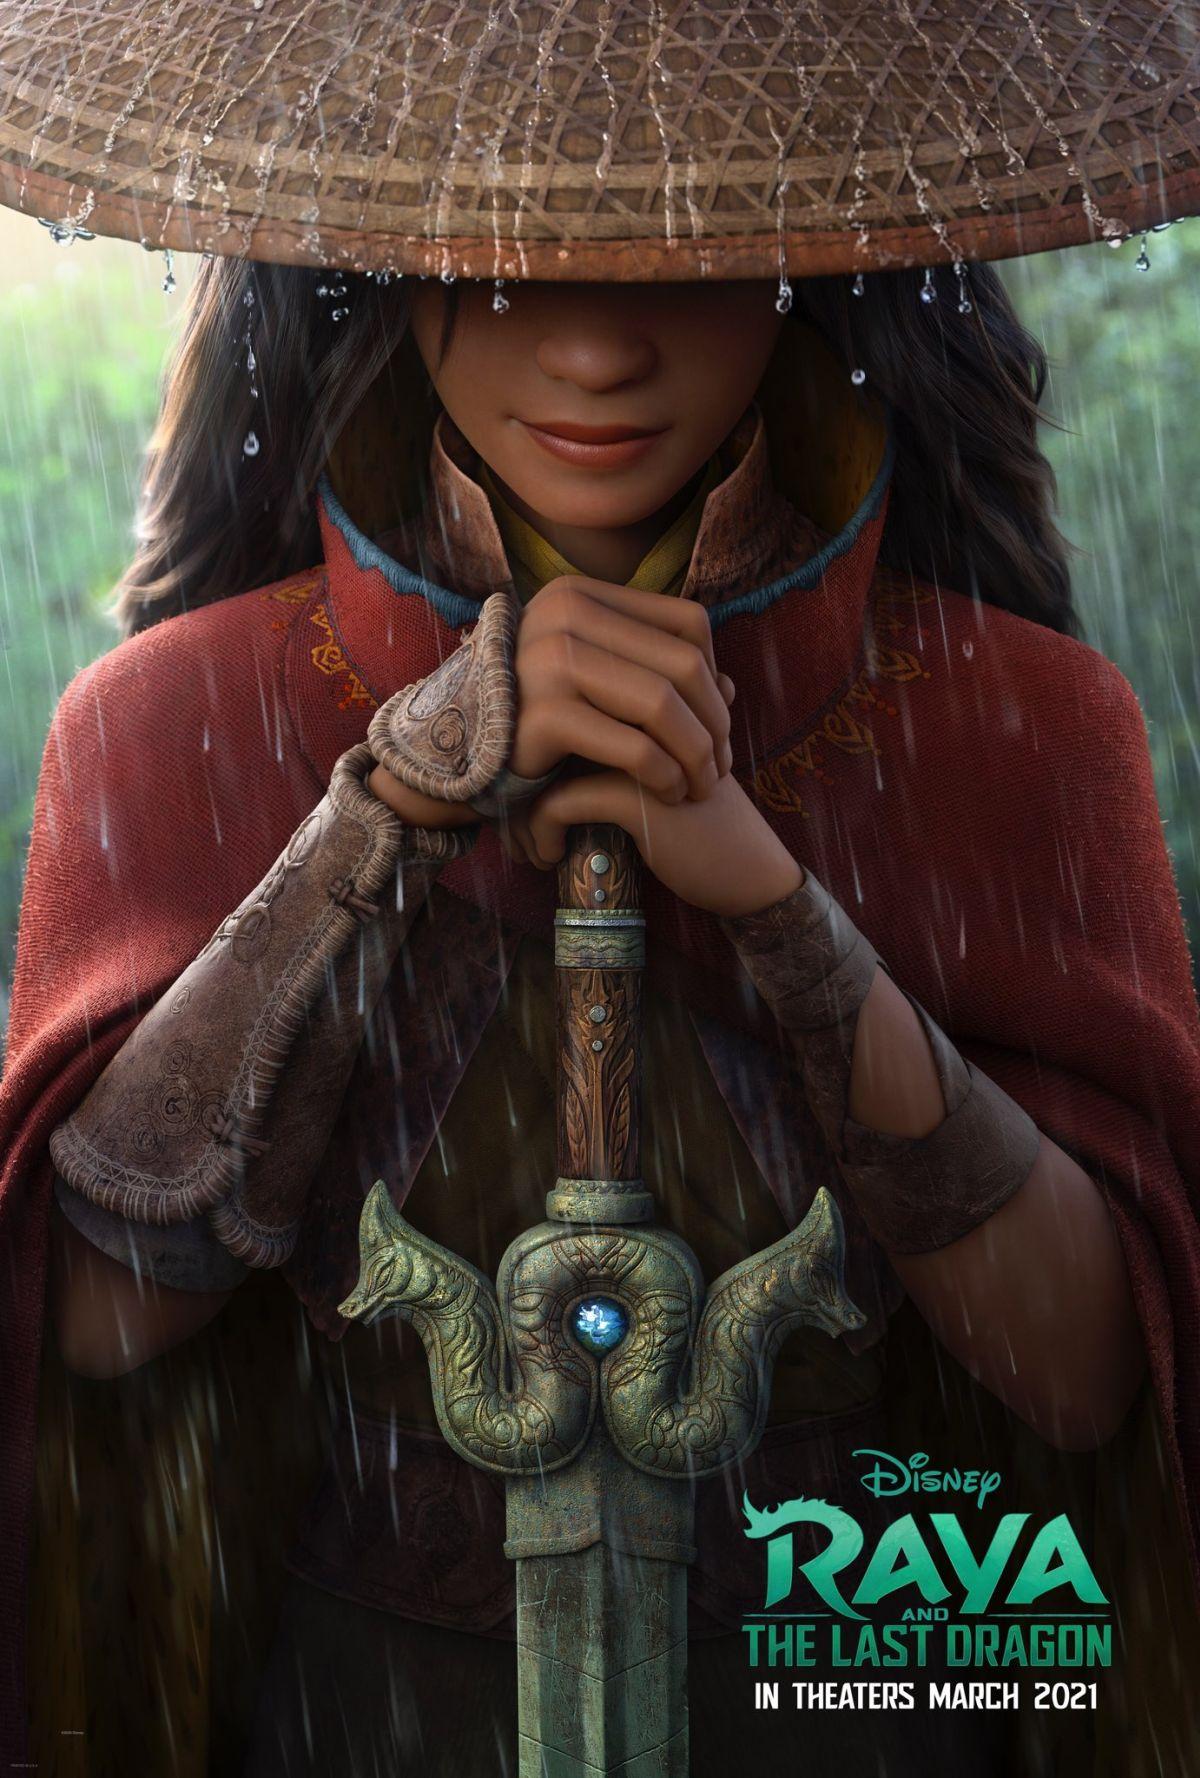 Raya the Last Dragon